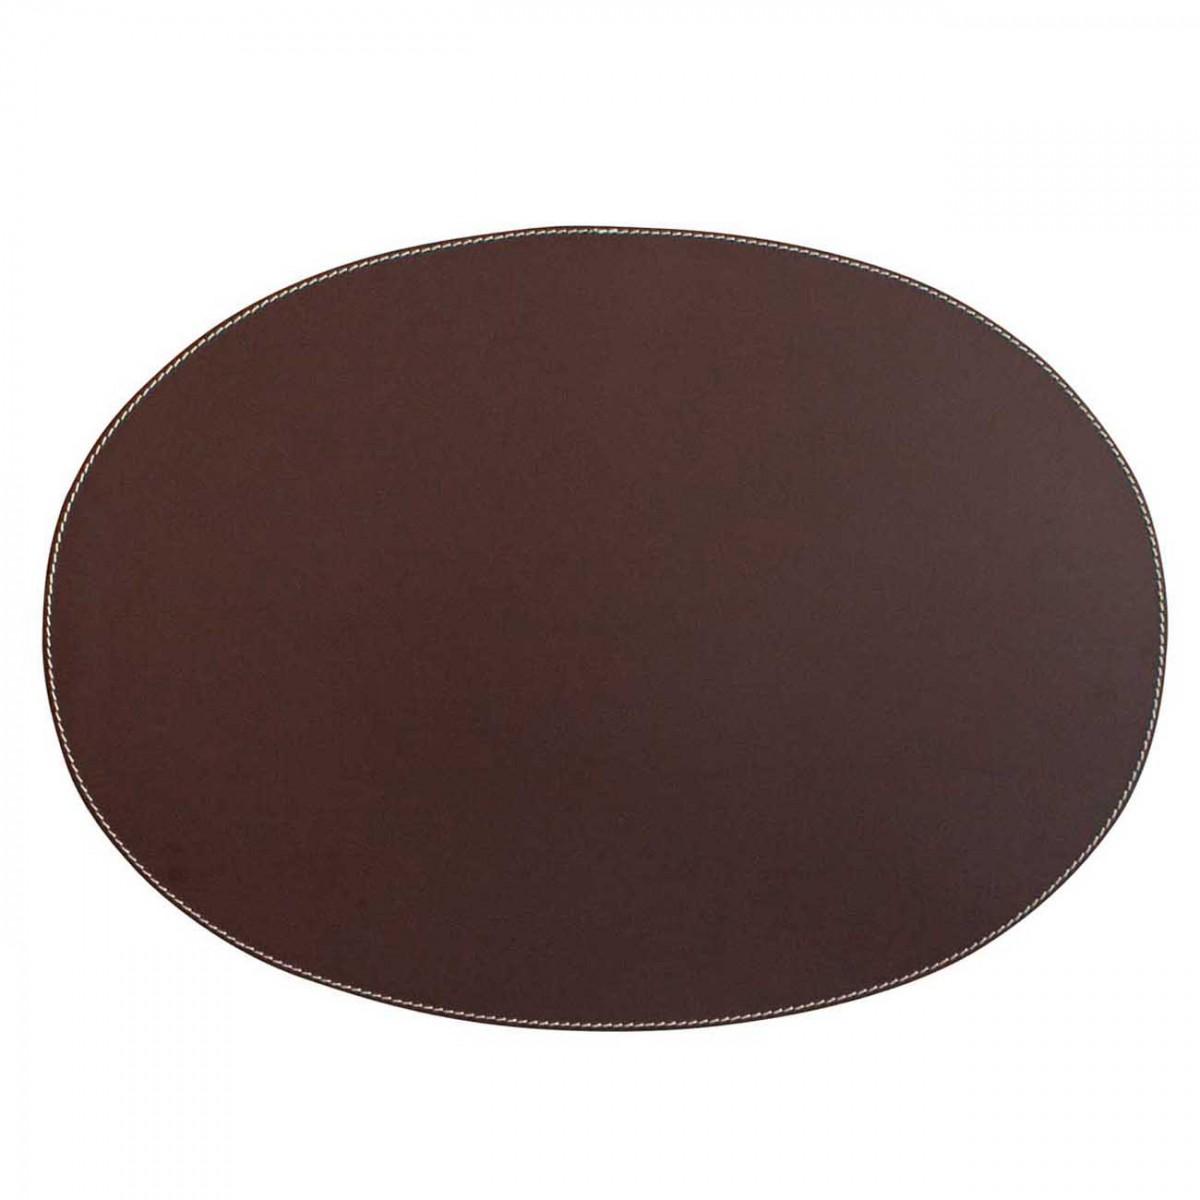 adorist. -Leder Tischset, Lederunterlage, oval, braun